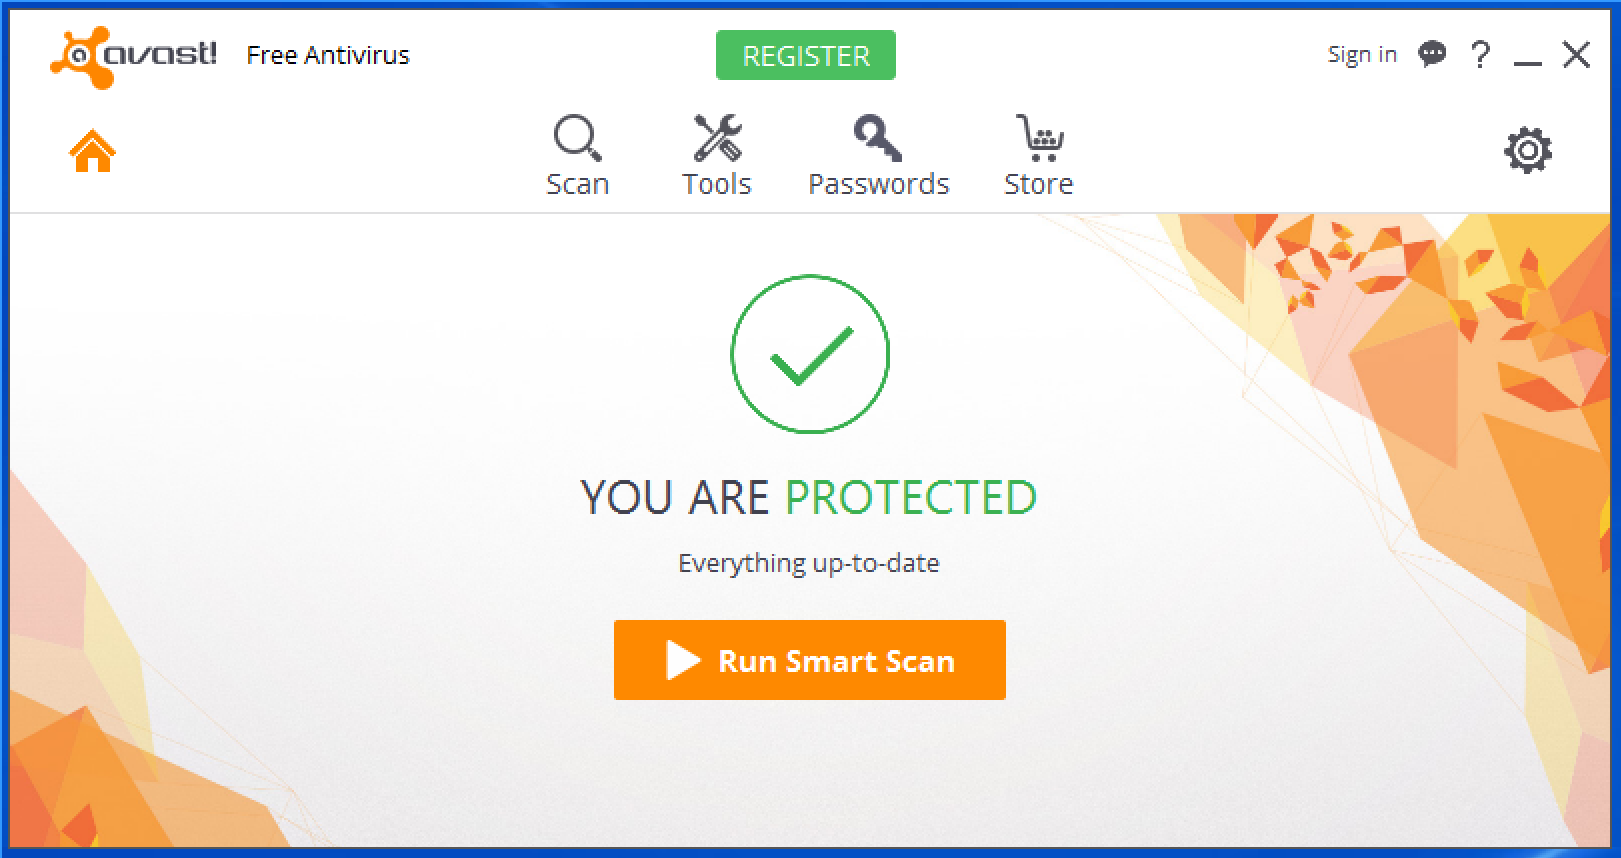 avast free antivirus guard